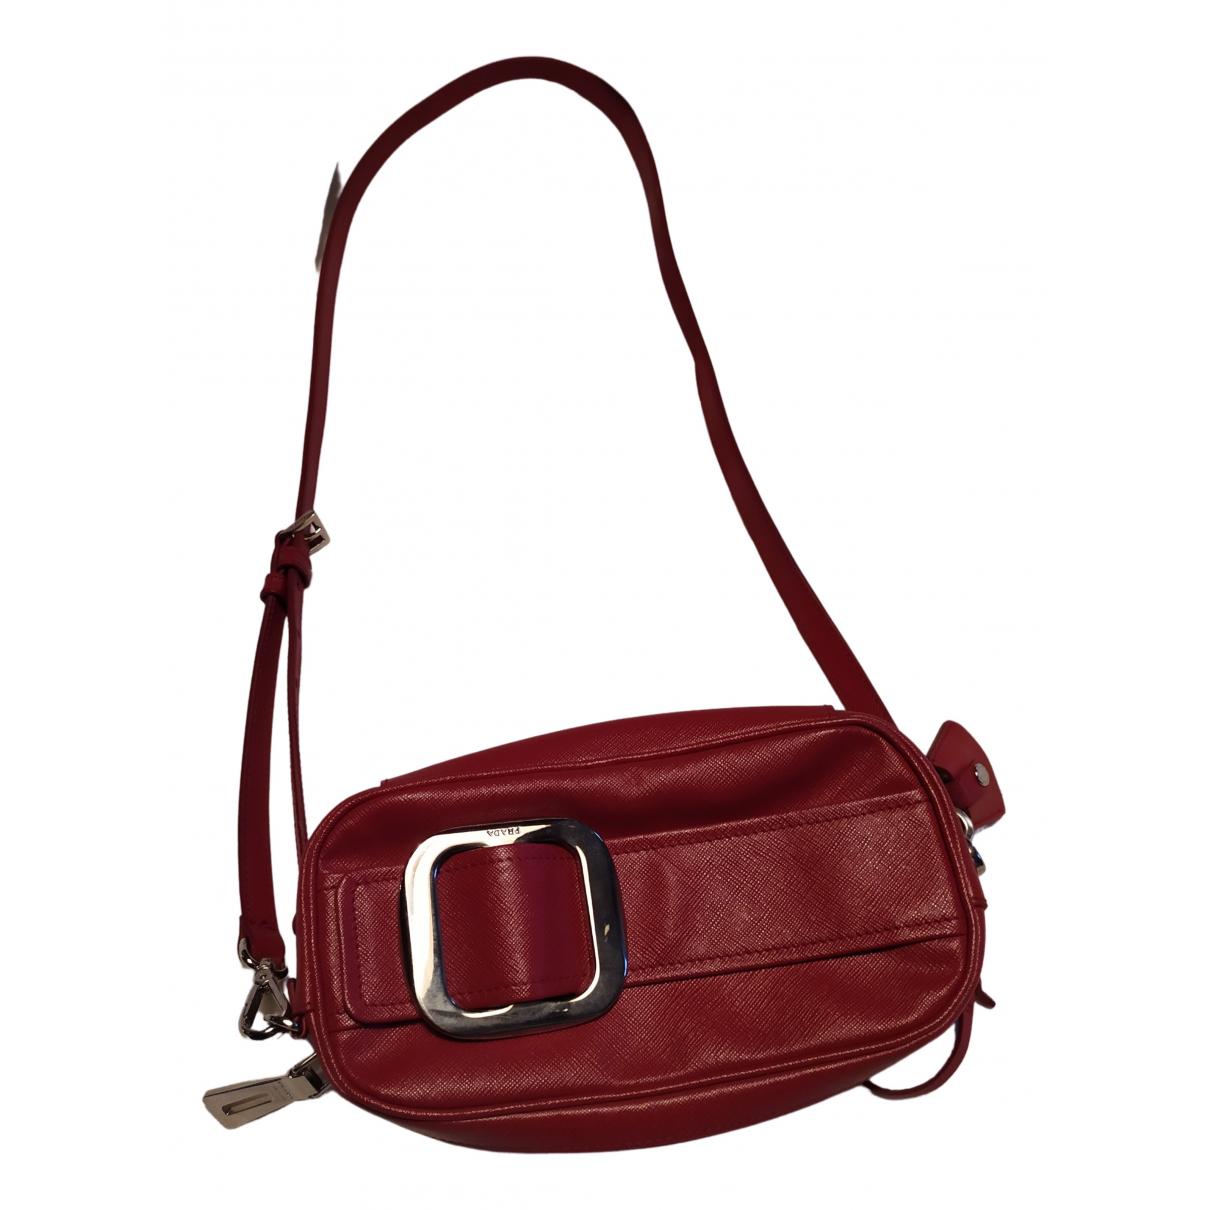 Prada N Red Leather Clutch bag for Women N